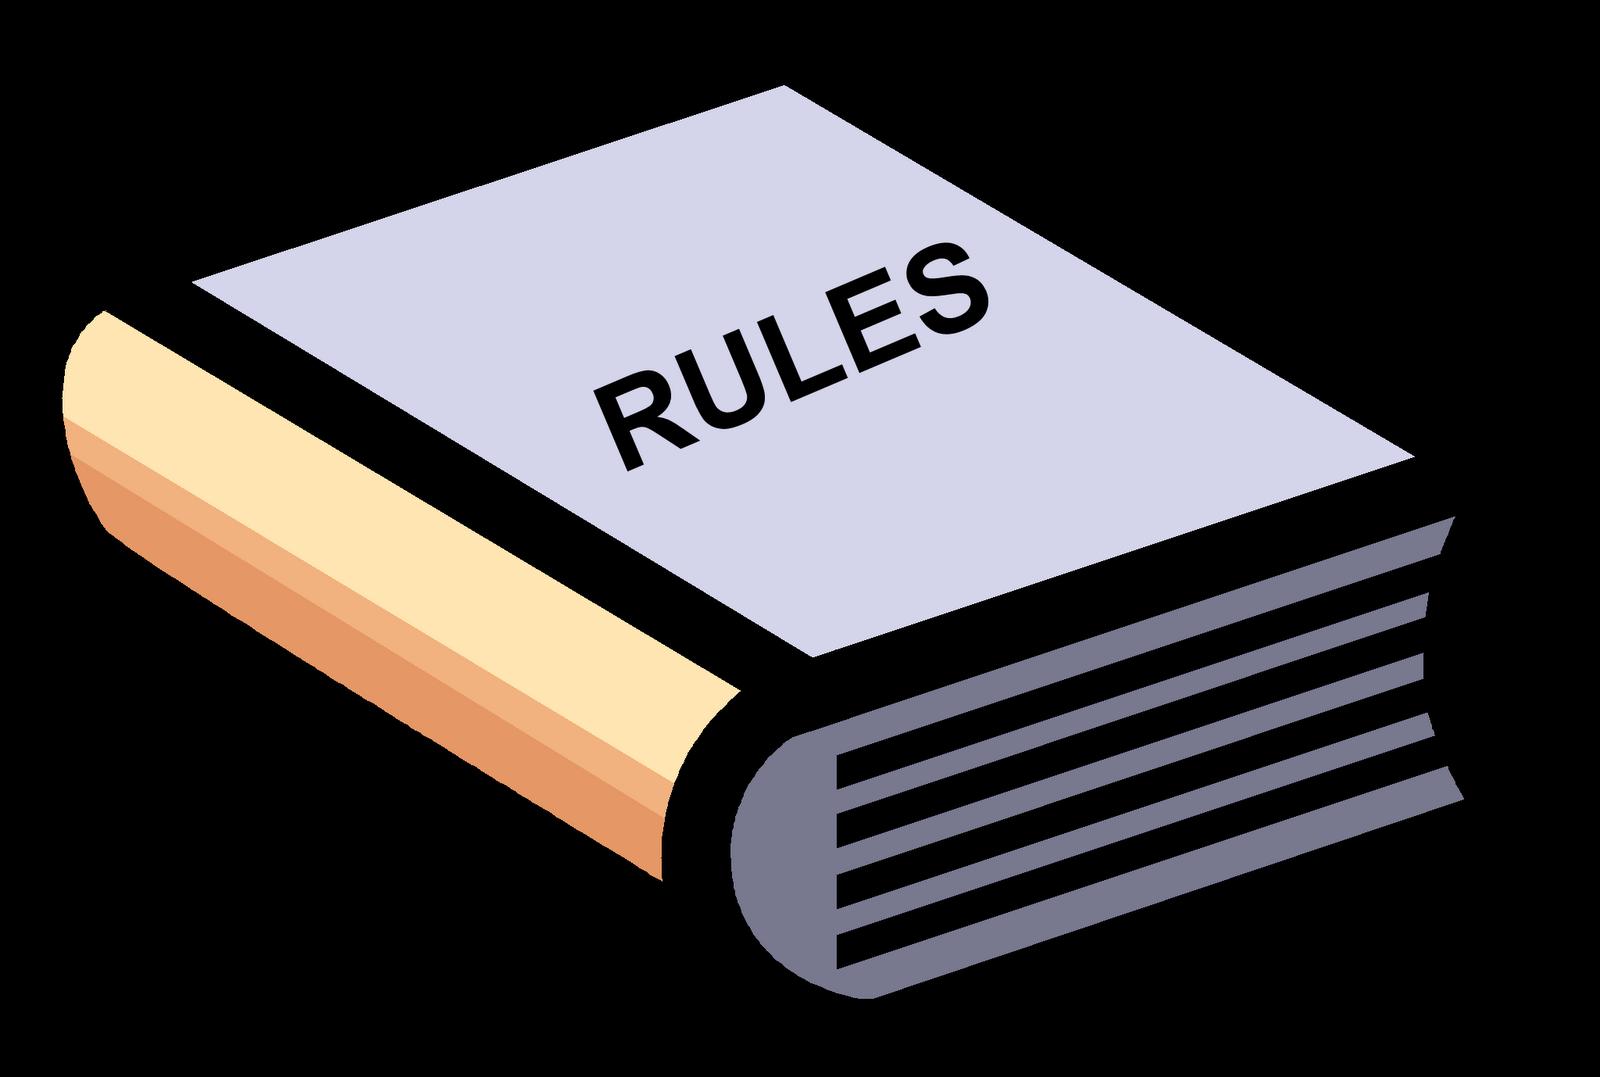 Law book clipart graphic library download Legislation Clipart | Clipart Panda - Free Clipart Images graphic library download